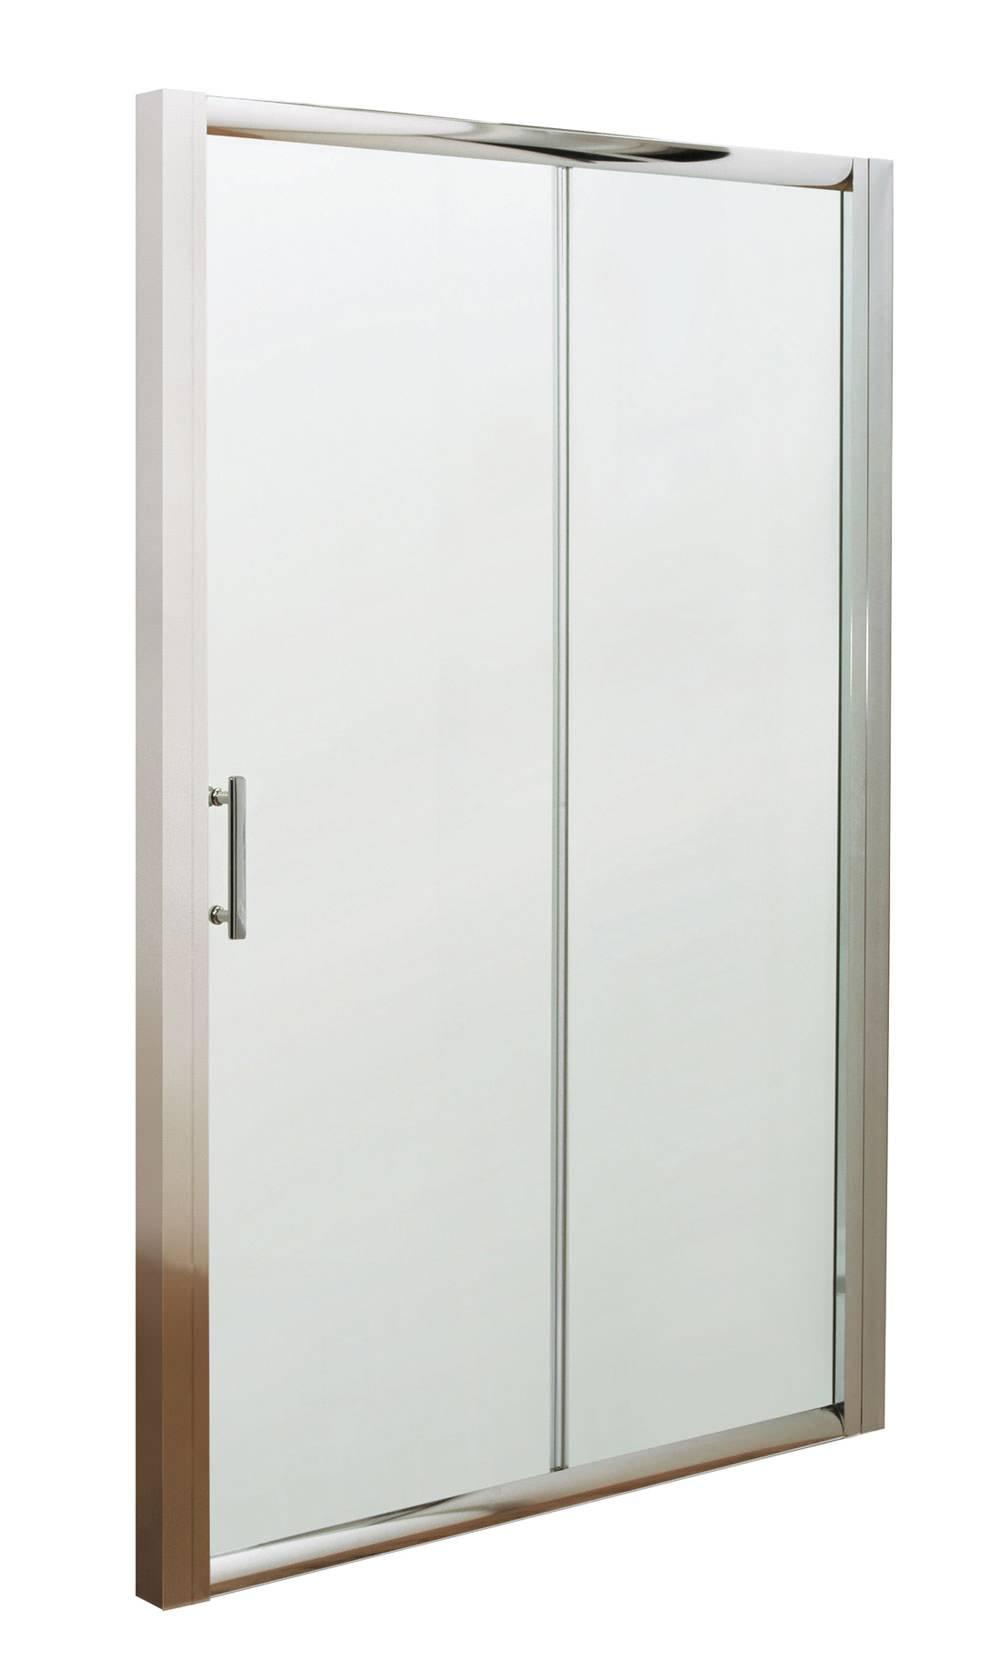 Beo framed sliding shower door 1000mm beo 1943 for 1000mm sliding shower door